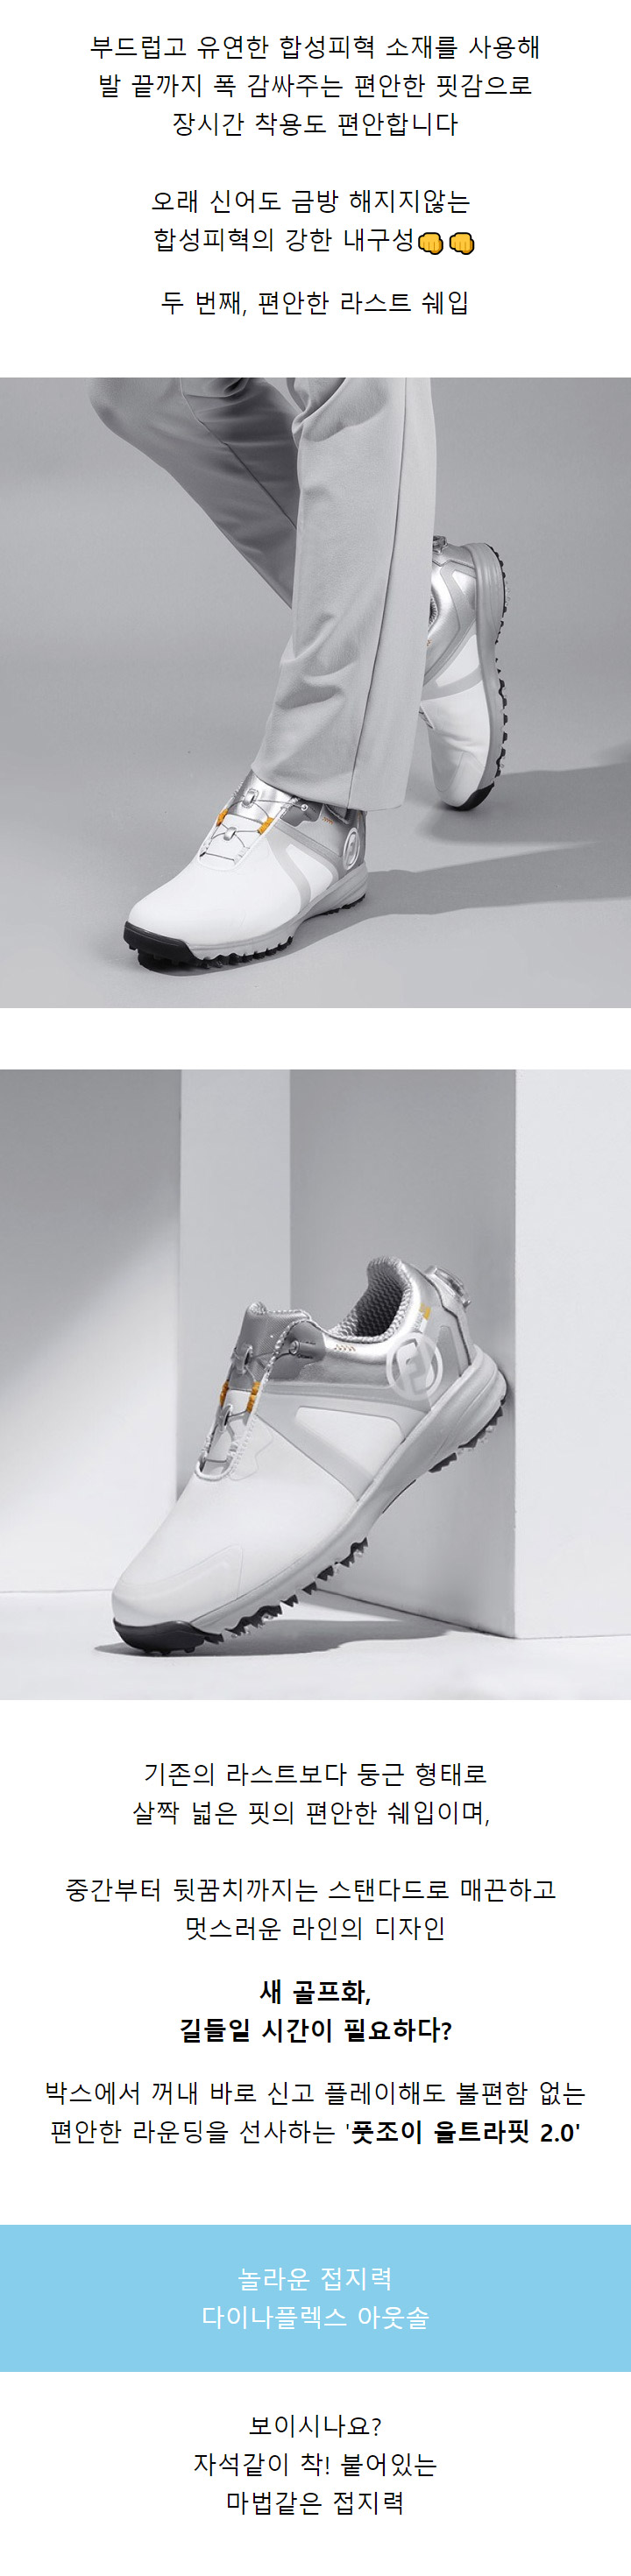 footjoy_ultrapit_20_boa_m_shoes_21_1_13.jpg